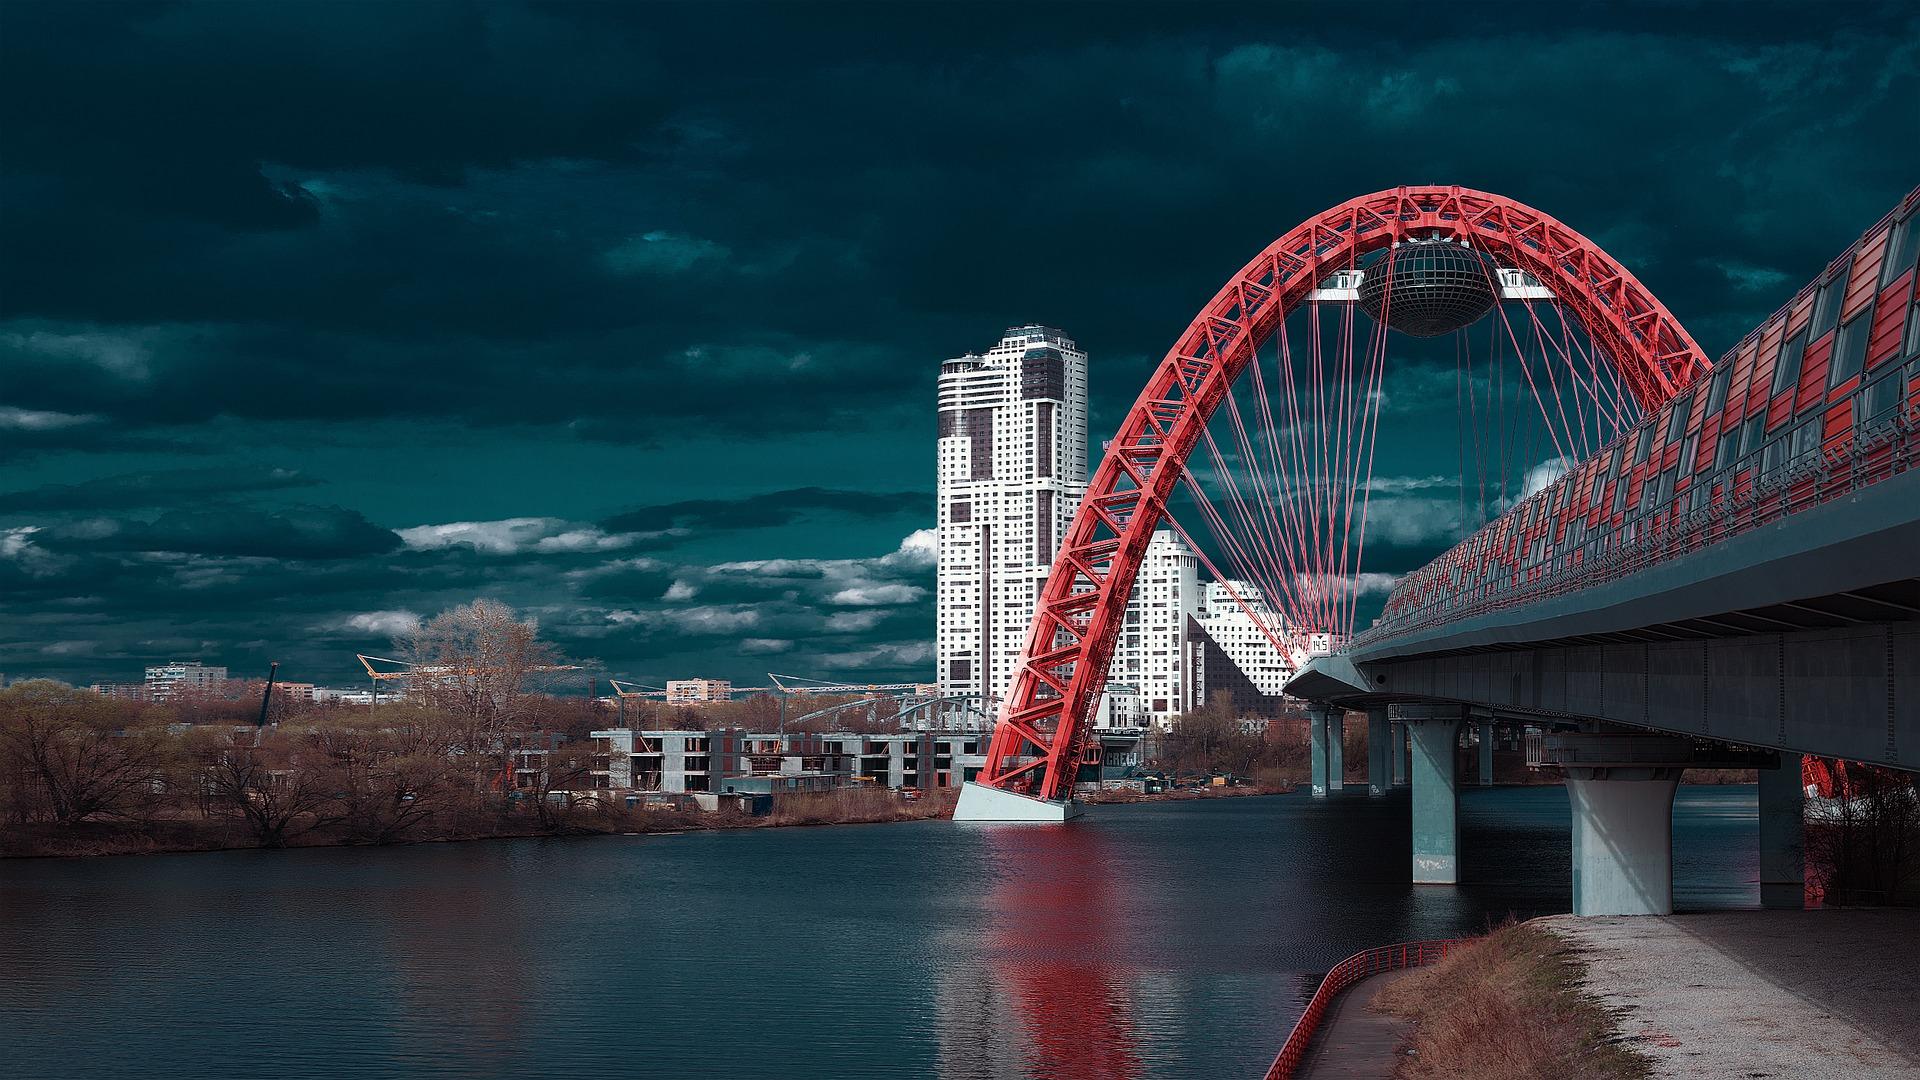 The picturesque bridge photo